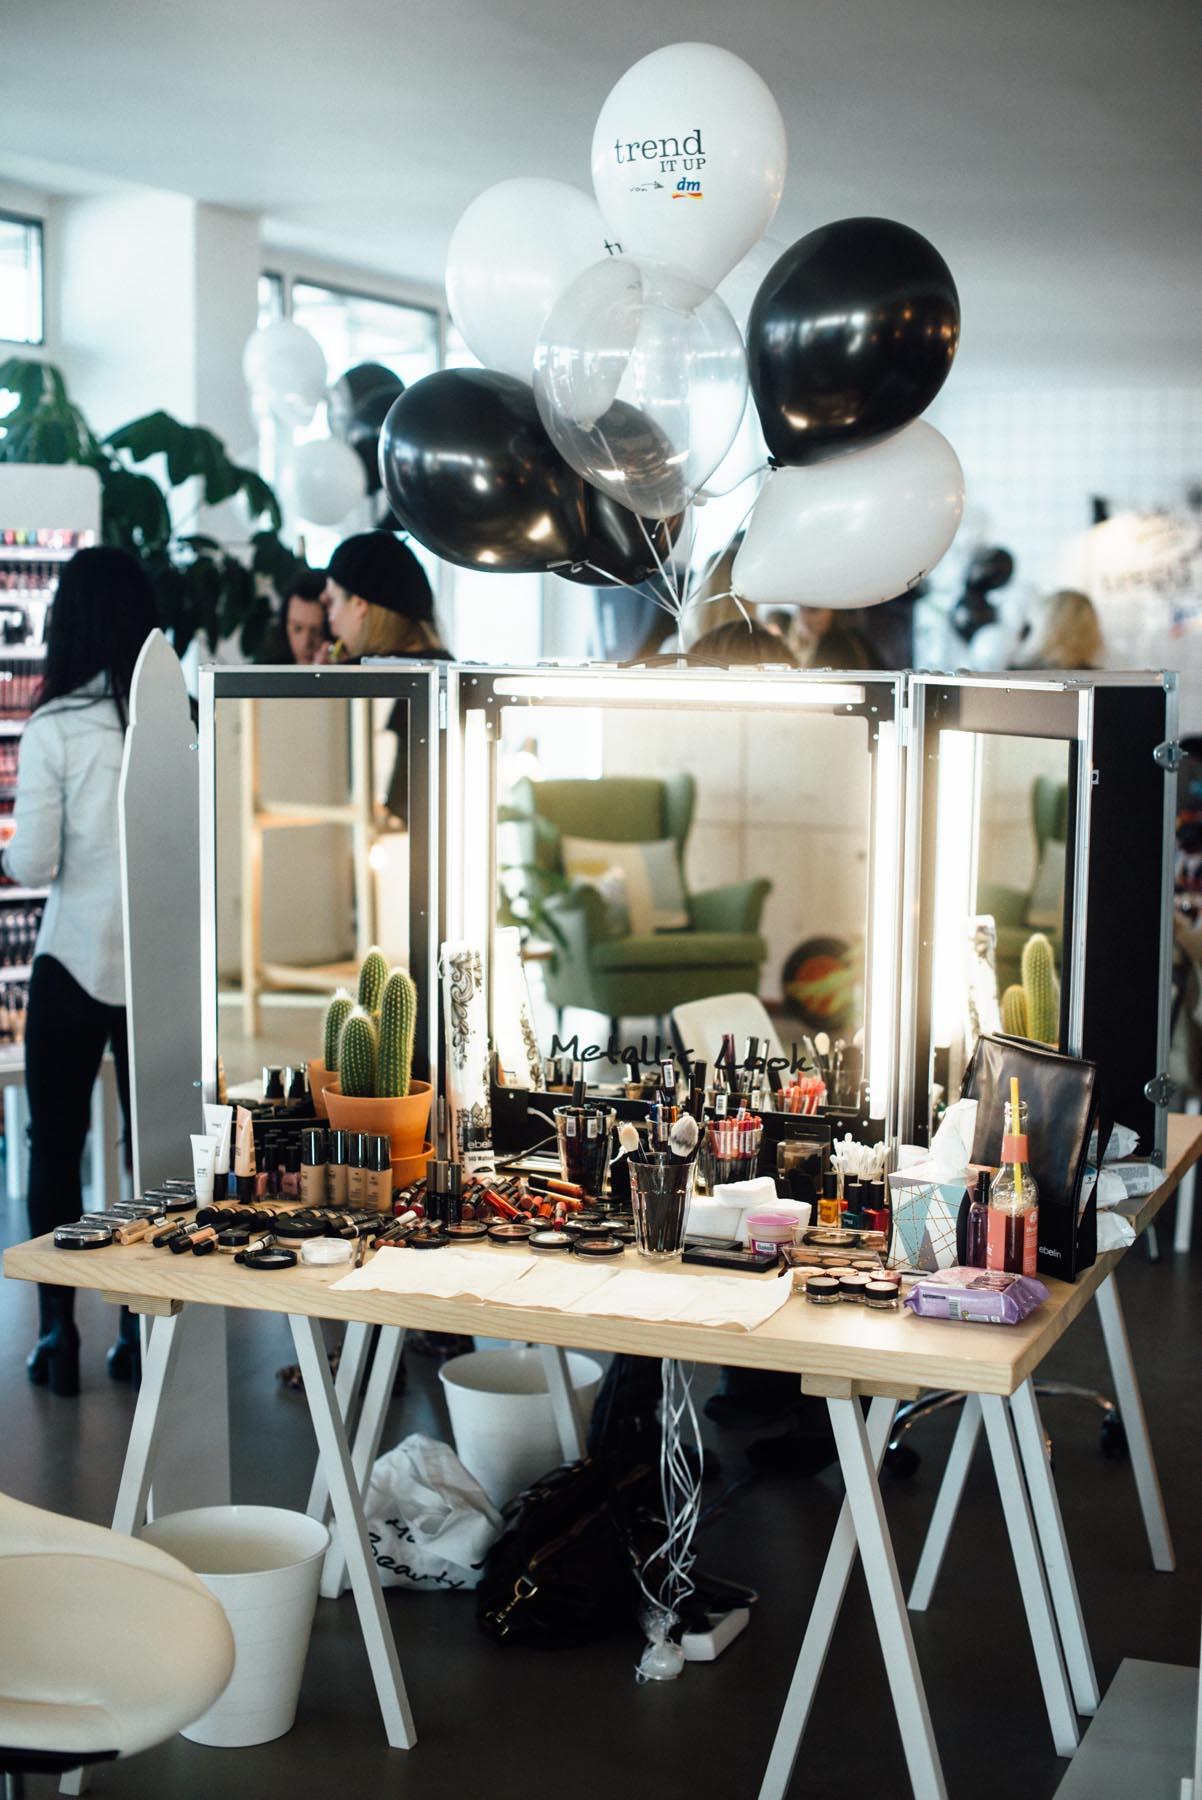 16-Kiamisu-Modeblog-Fashionblog_Kassel_dm trend it up_event_neue theke_neuheiten_ab märz_neuprodukte-4_final